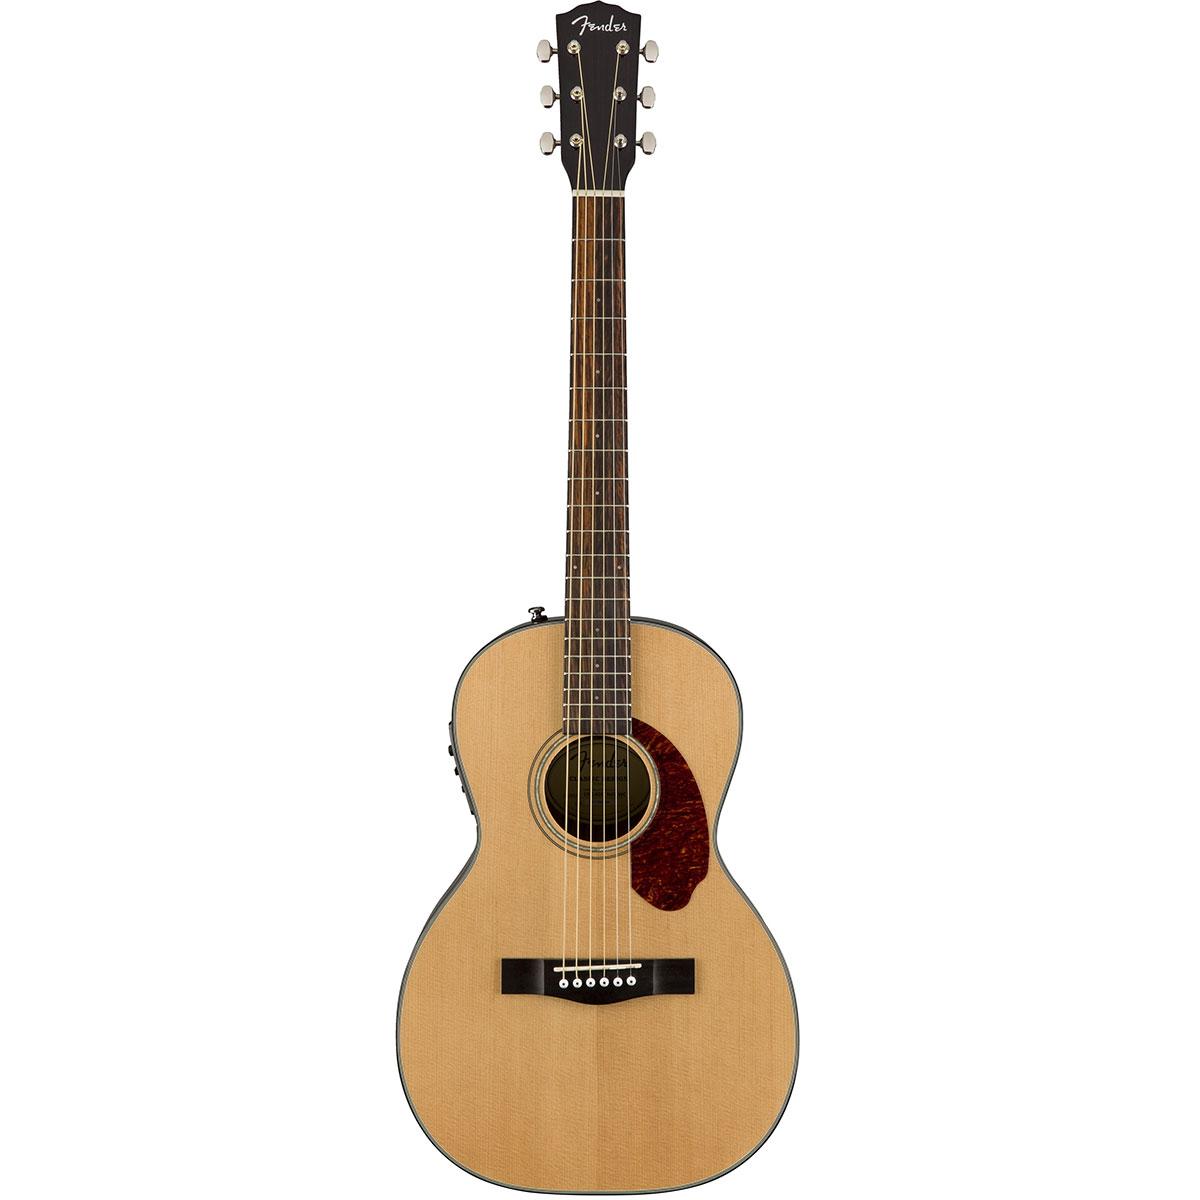 Fender - CP-140SE Naturelle